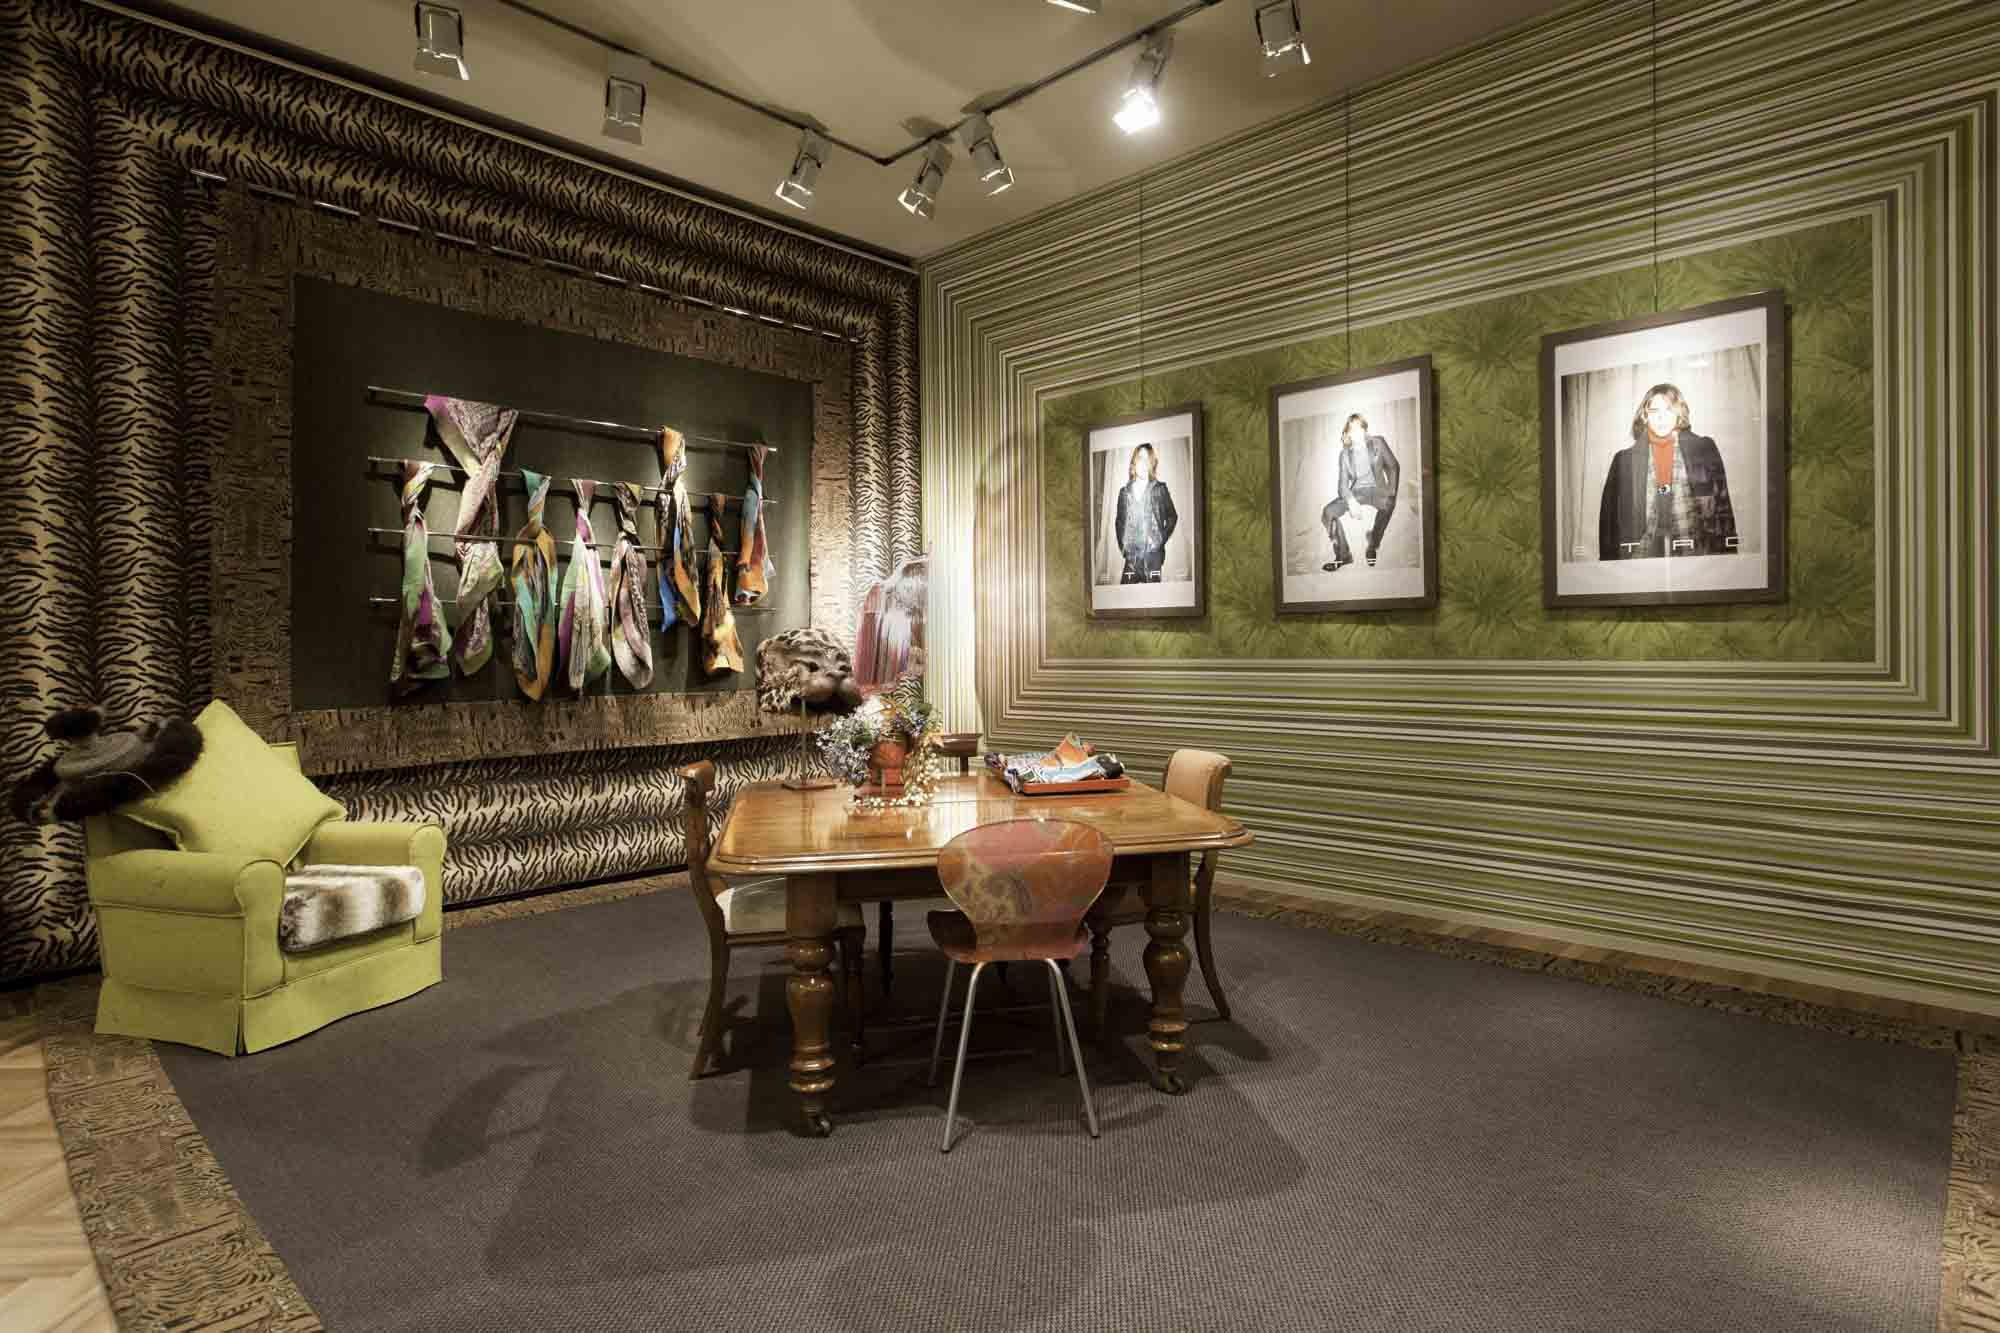 Uanof studio studio fotografico milano architettettura for Studio design interni milano